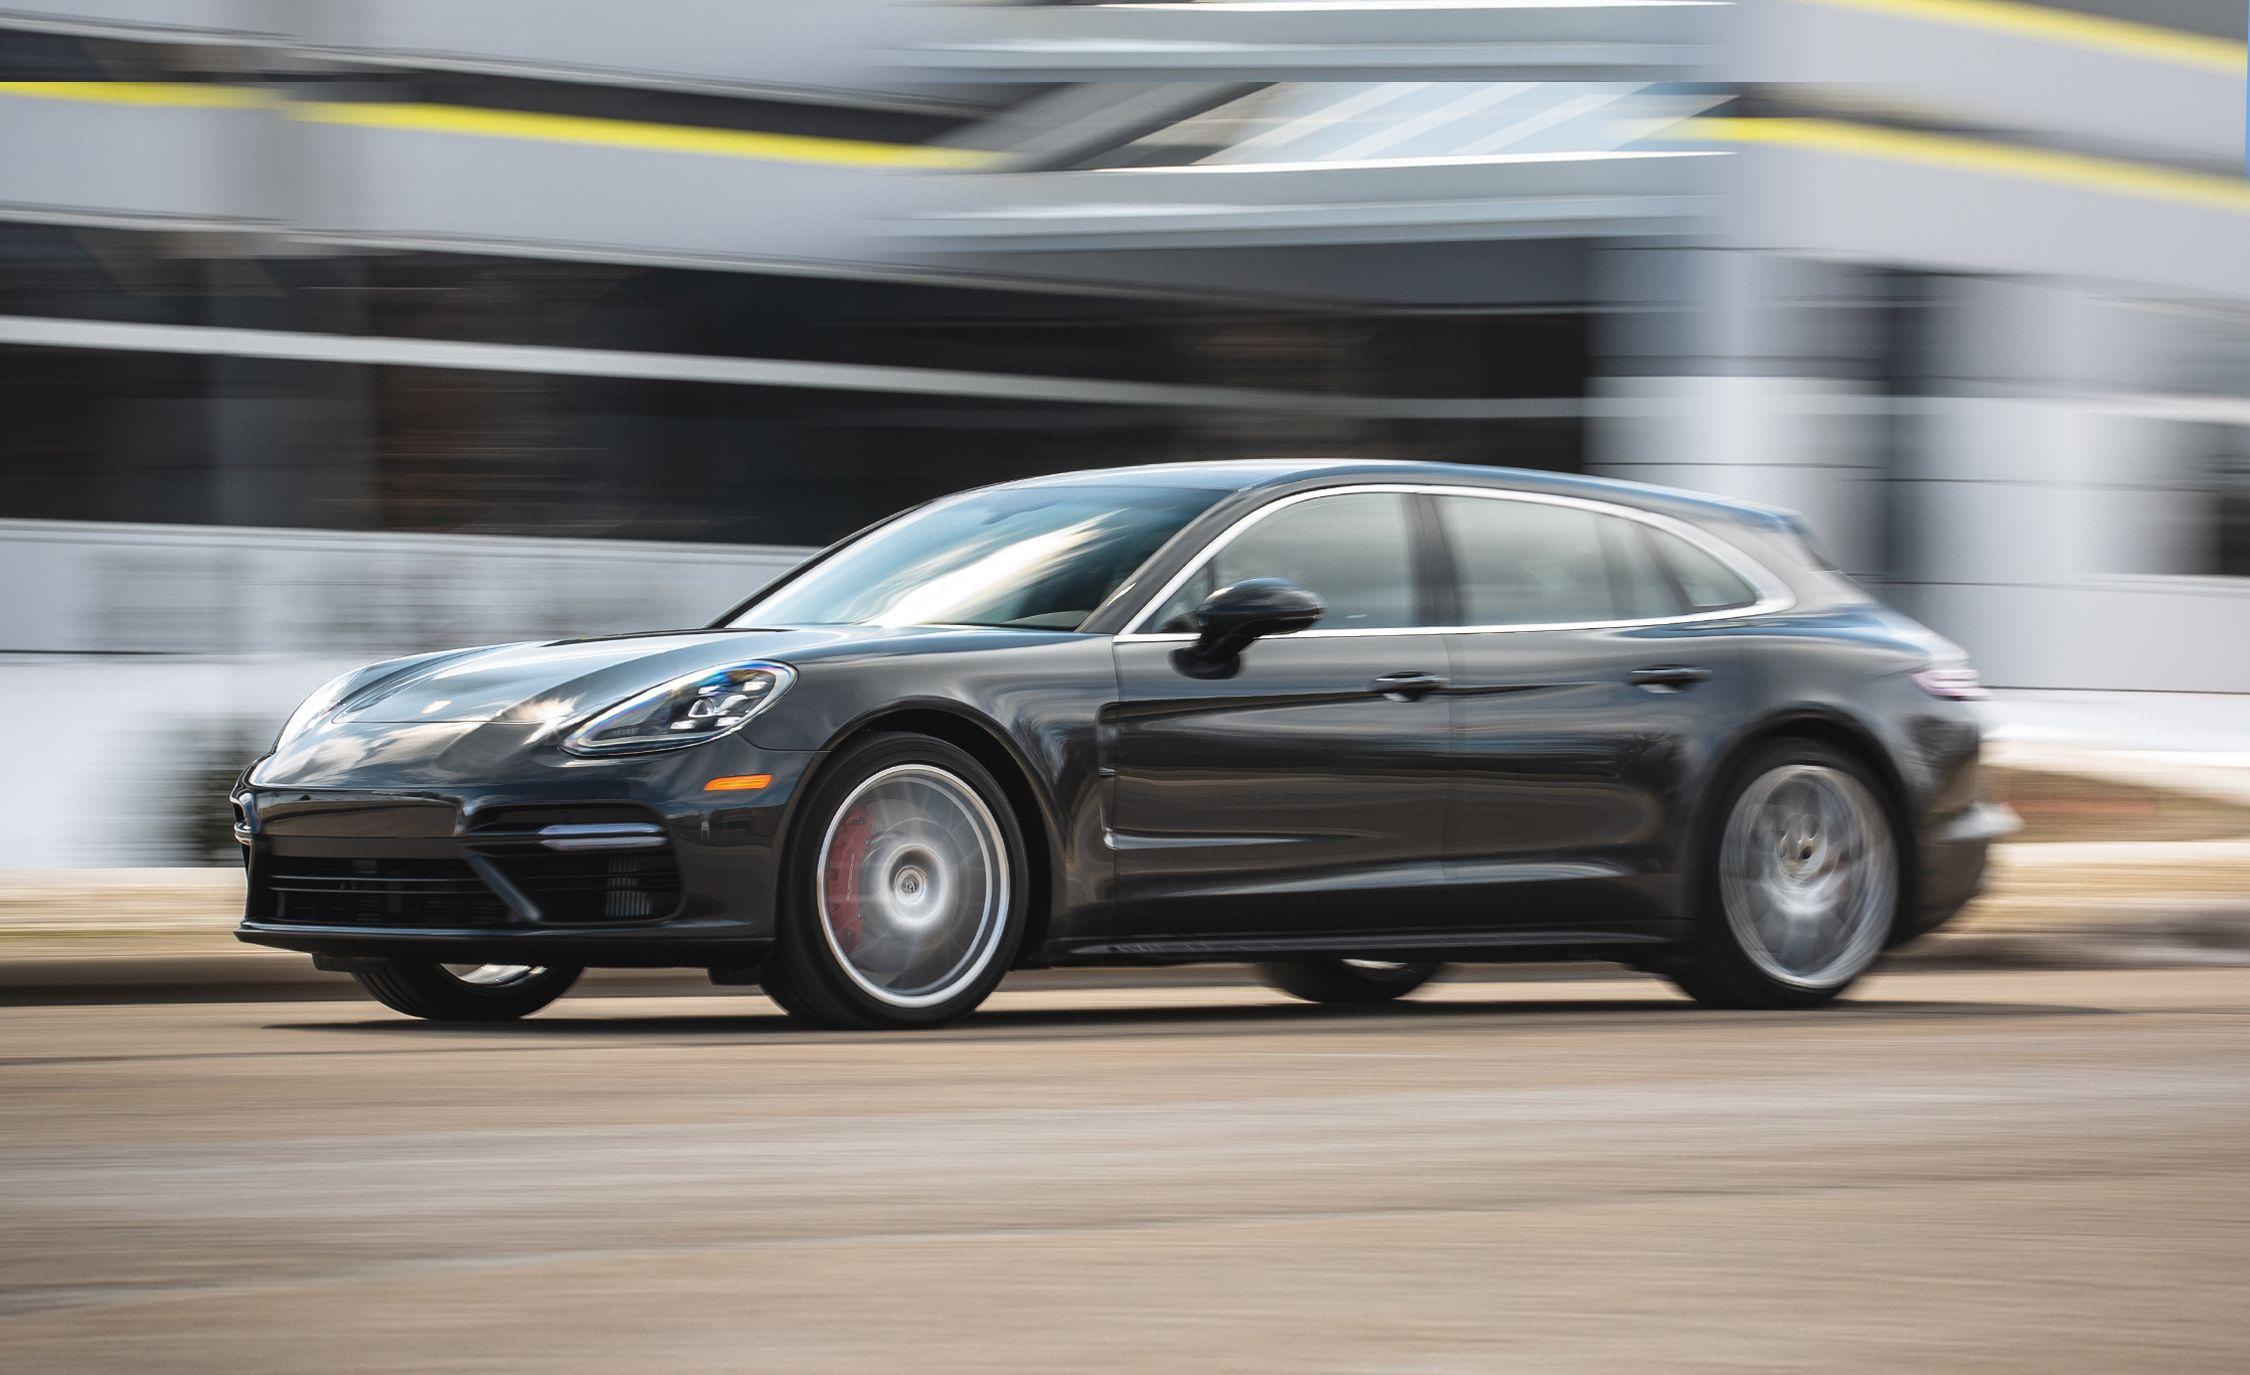 2019 Porsche Panamera Sport Turismo Review, Pricing, and